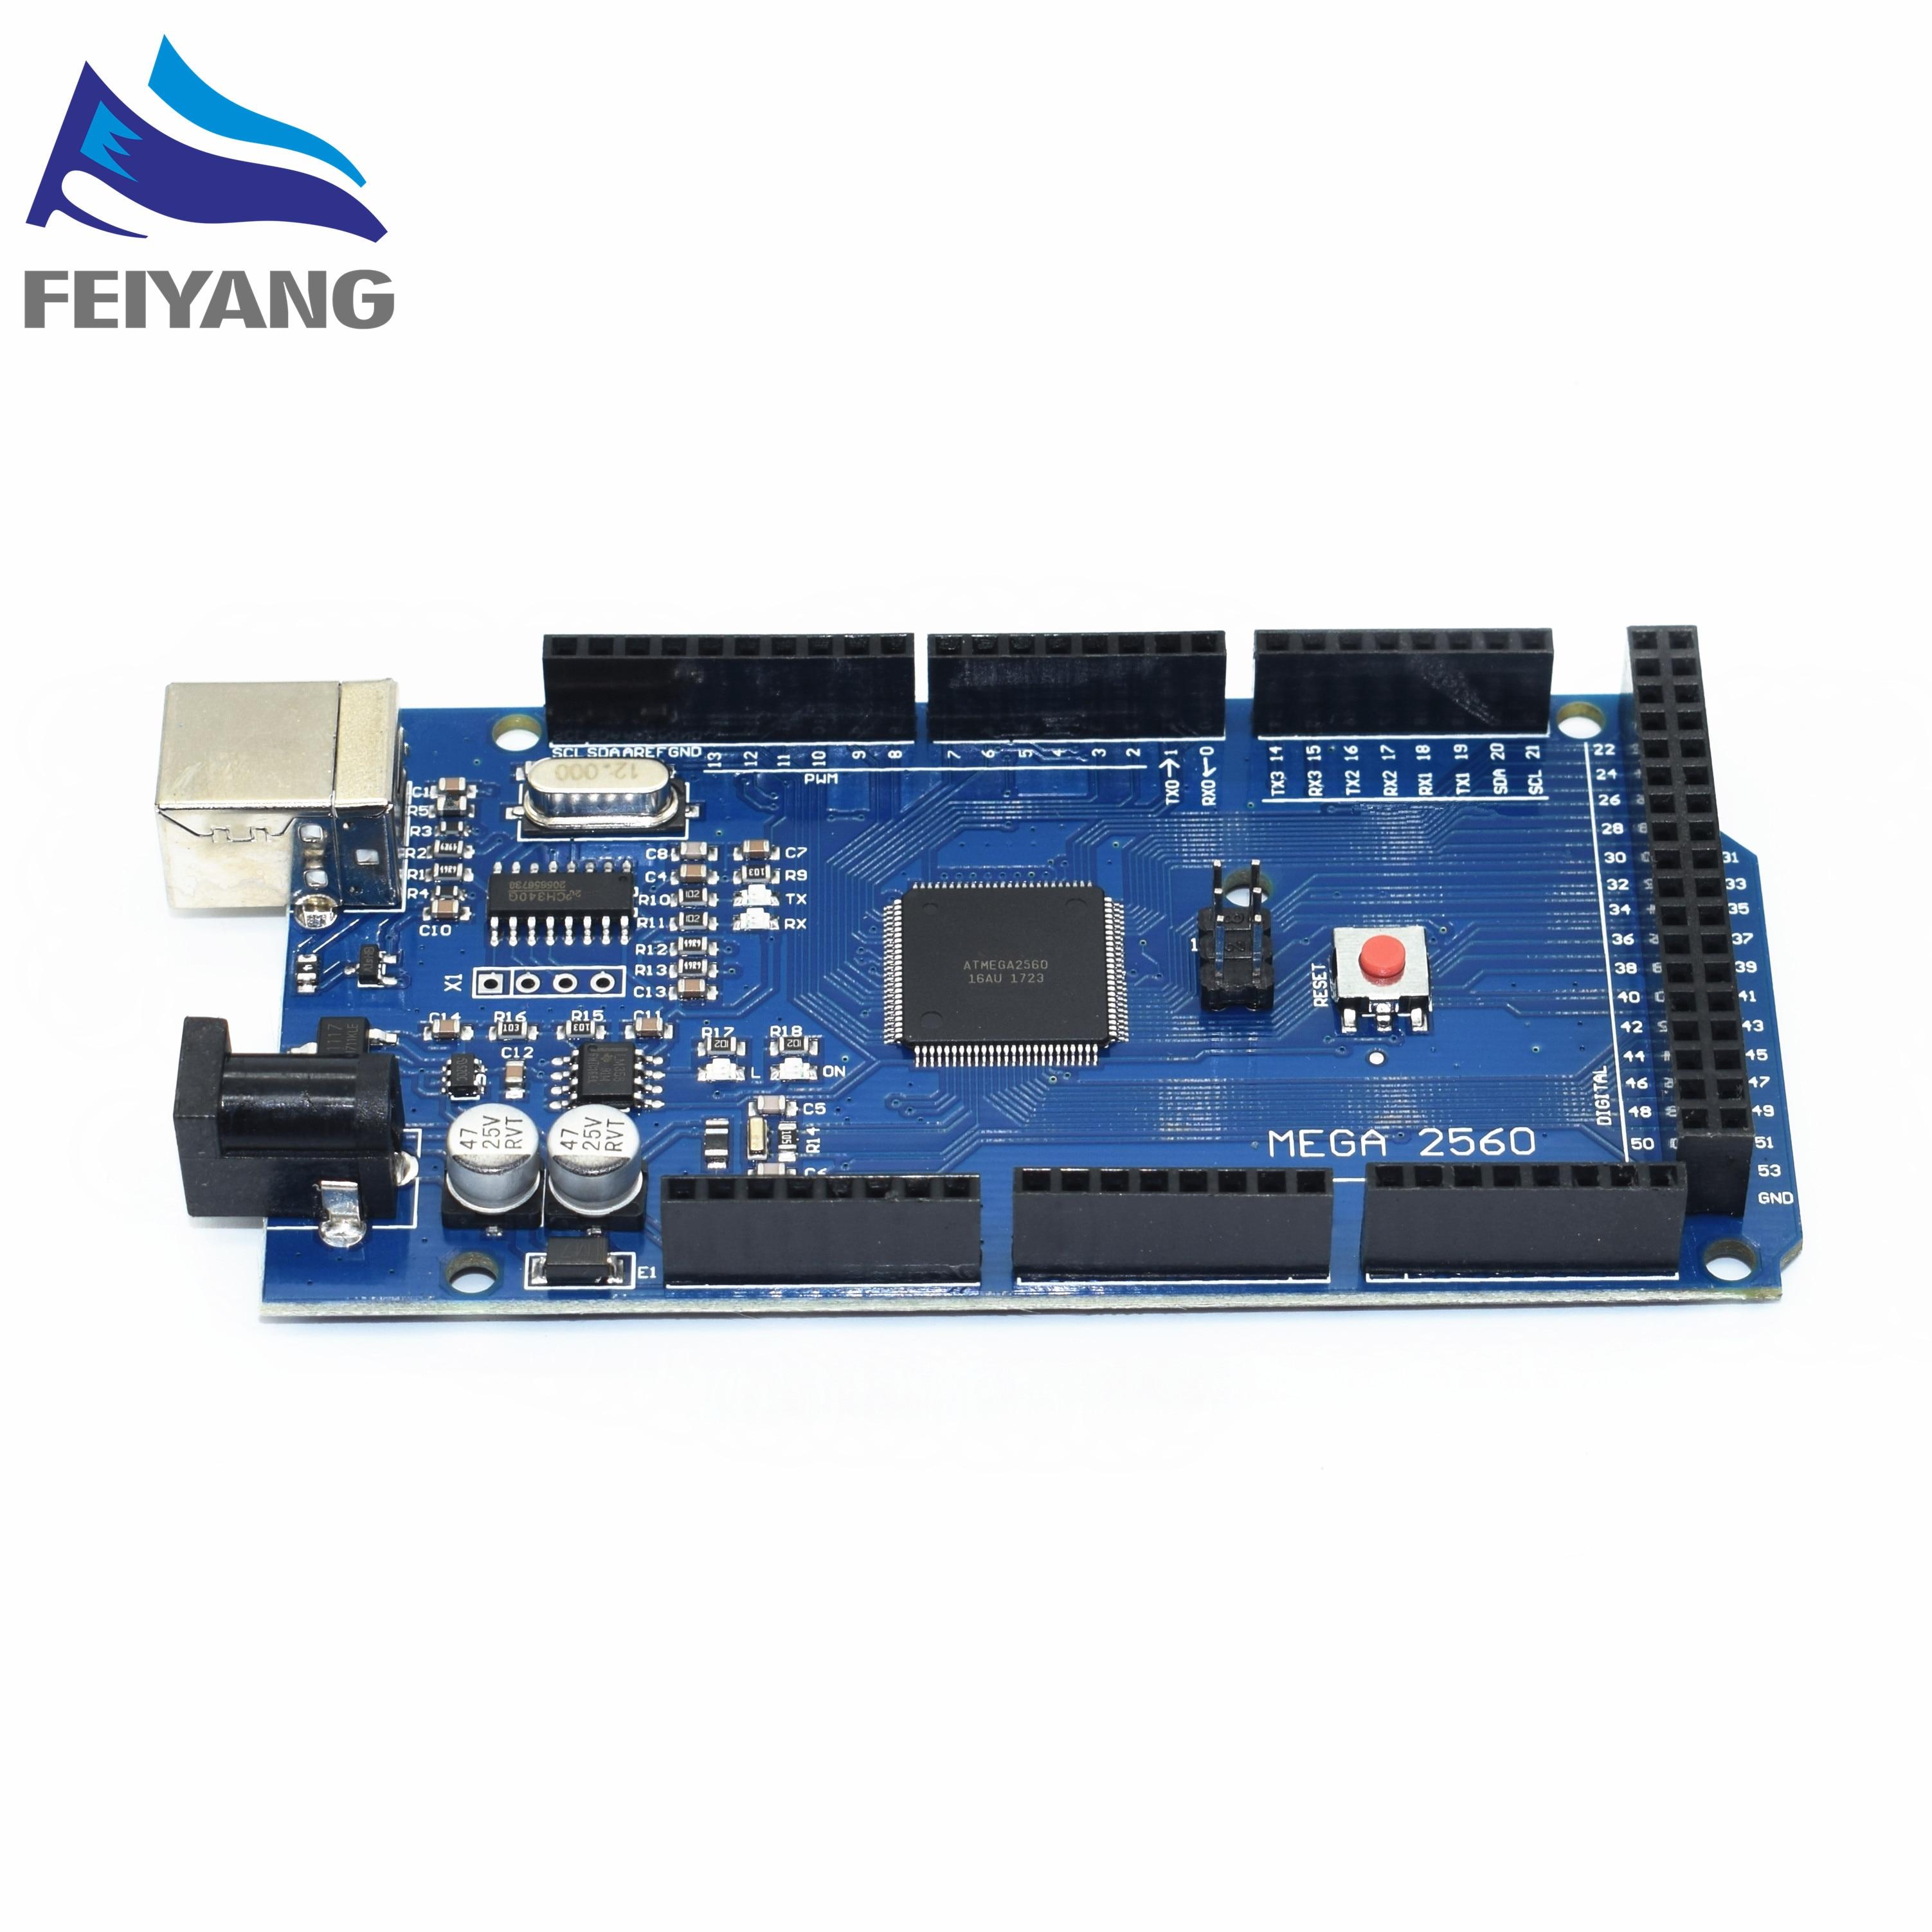 10PCS SAMIORE ROBOT MEGA2560 MEGA 2560 R3 ATmega2560 16AU CH340G AVR USB board with without USB